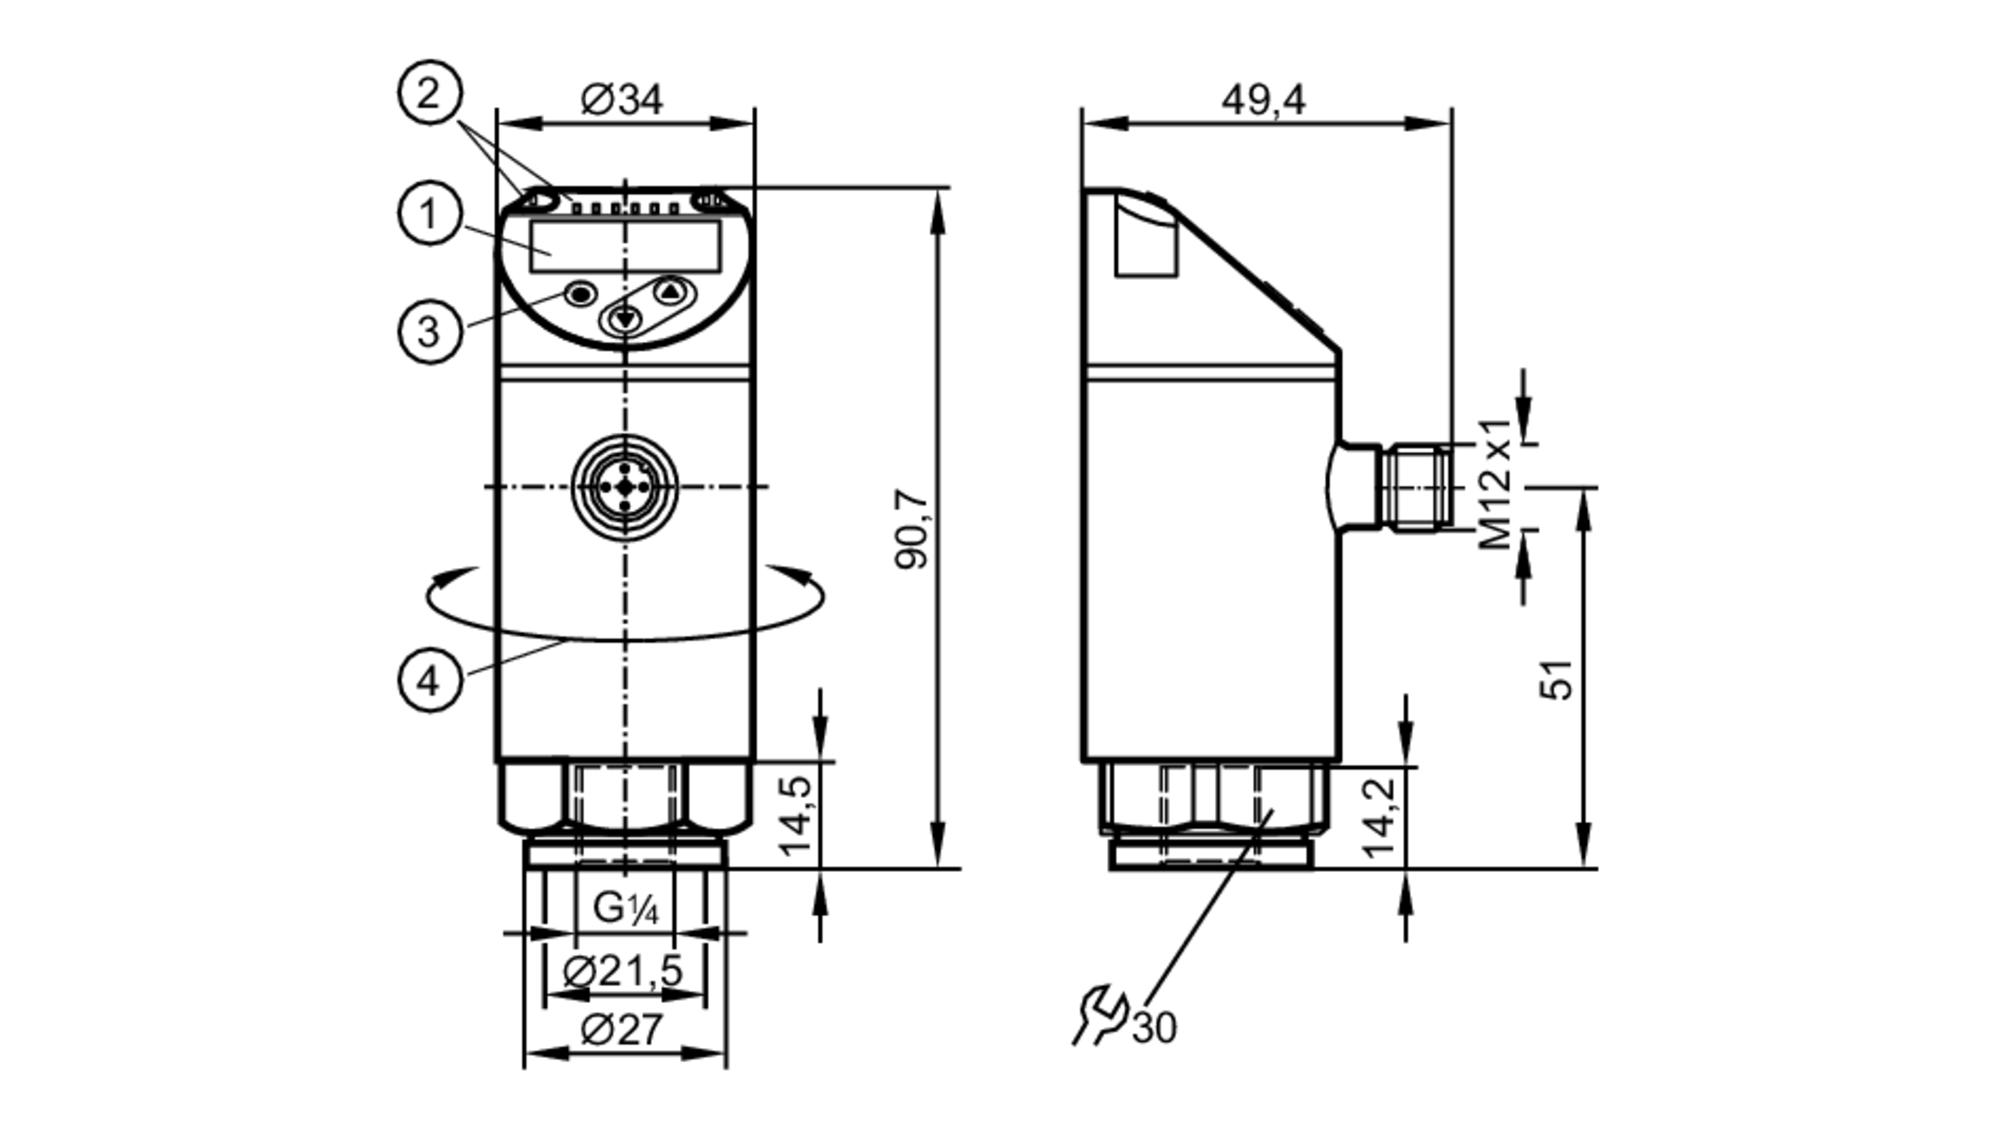 Pn7094 Pressure Sensor With Display Ifm Electronic